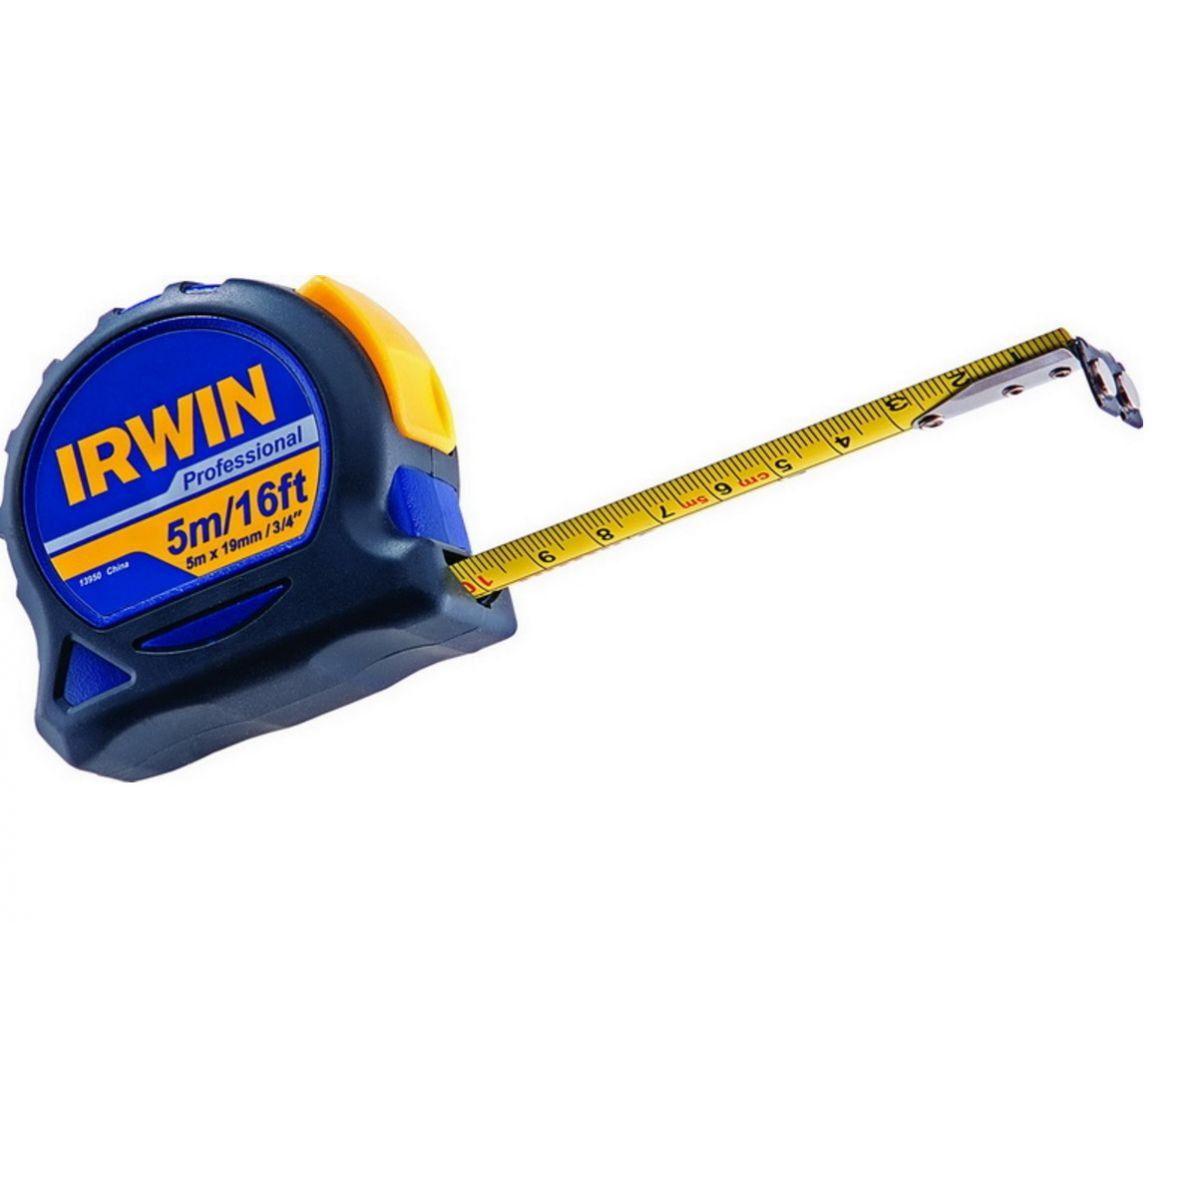 "TRENA PROFESSIONAL IRWIN 5 M / 16 FTX 3/4""  IW13950"